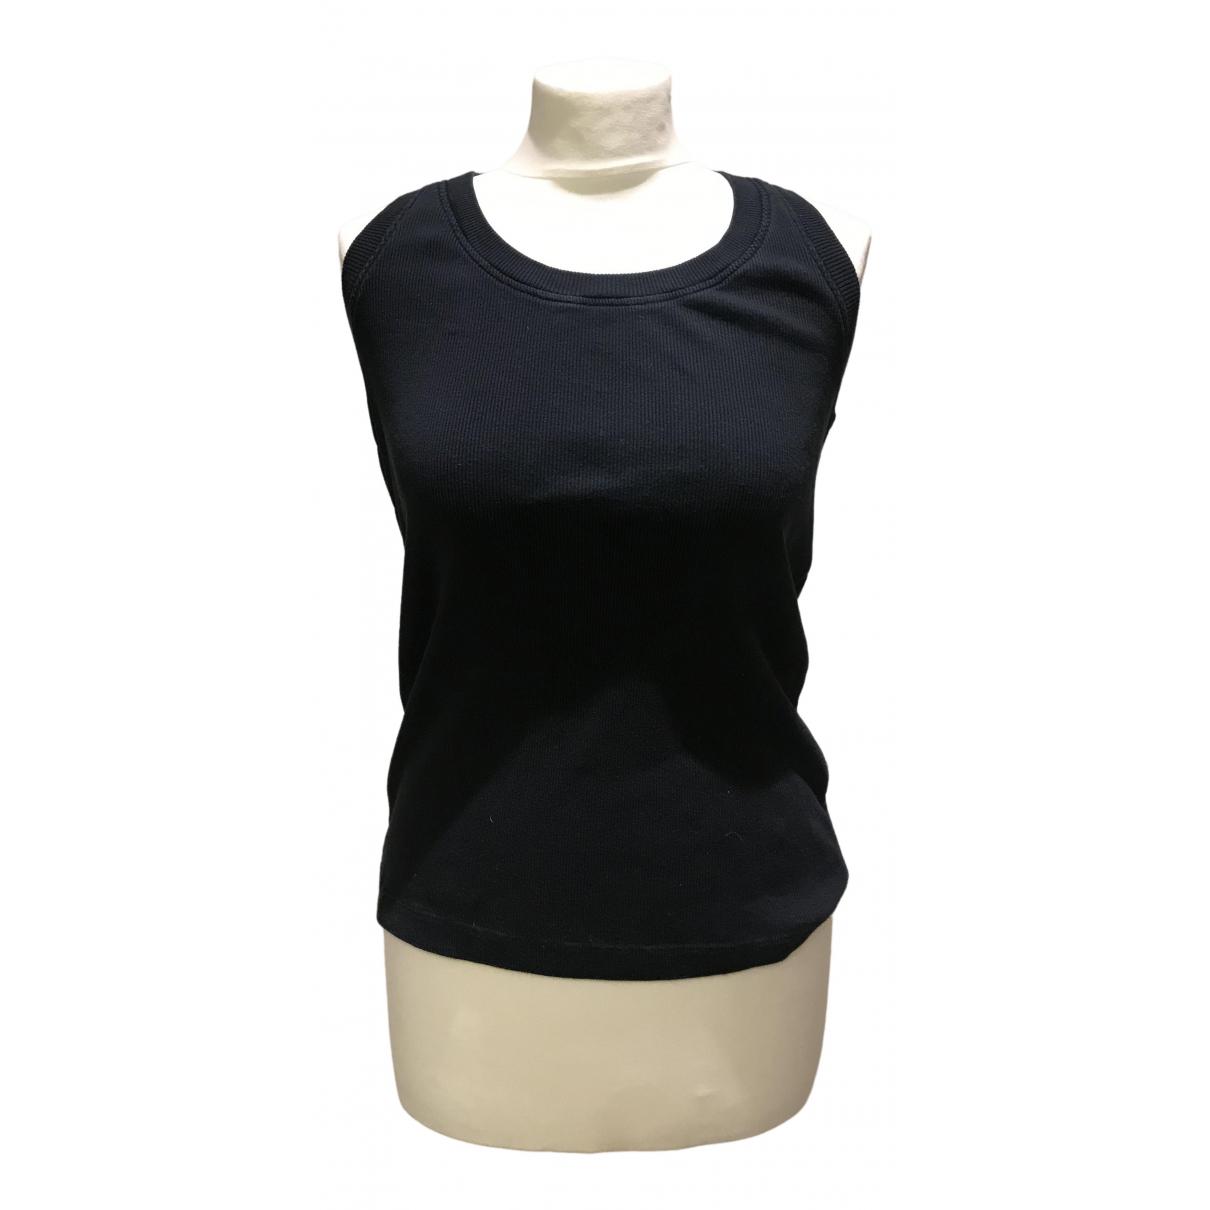 Maison Martin Margiela \N Black Cotton  top for Women 40 IT